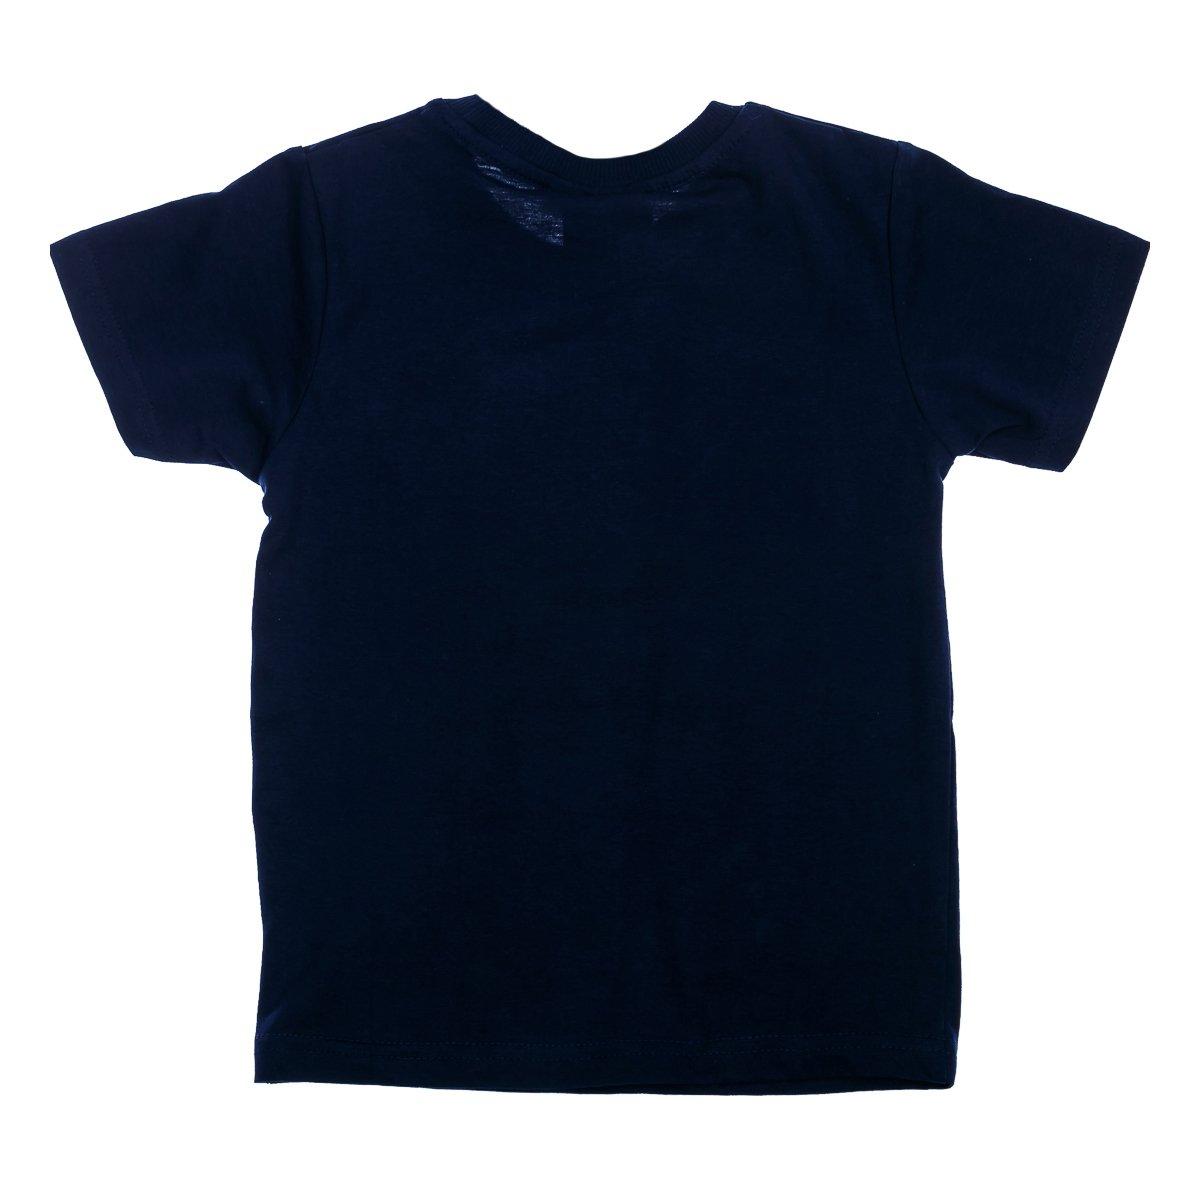 Купить Футболки, майки, топы, туники, Футболка E Plus M Batman Blue, р. 122 BAT5202184 ТМ: E Plus M, синий